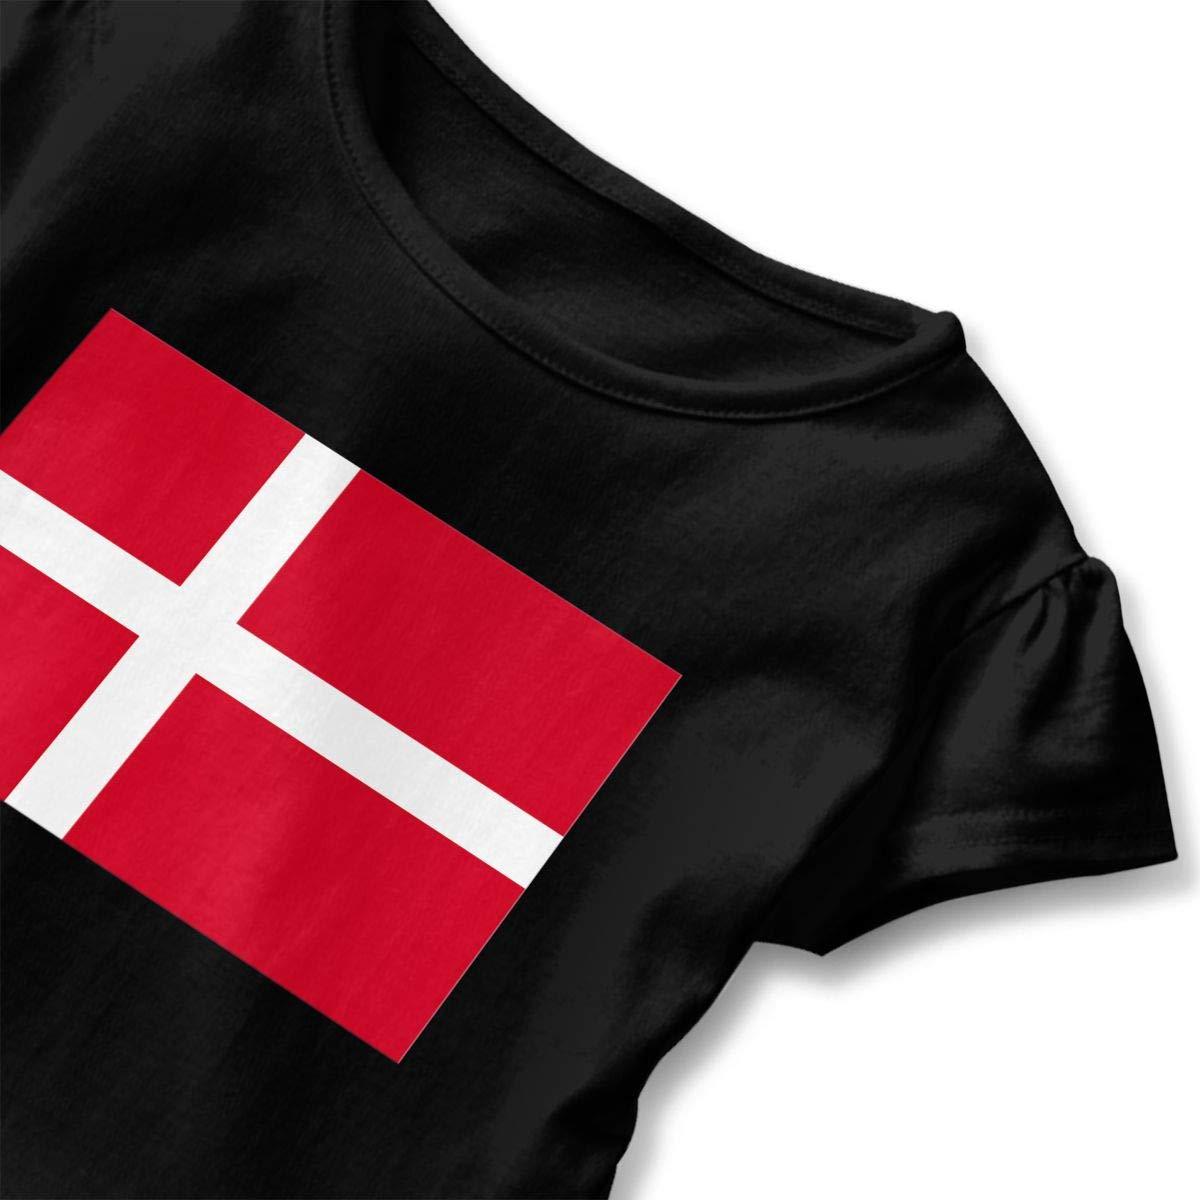 JVNSS Denmark Flag Shirt Soft Toddler Girls Flounced T Shirts Graphic Tees for 2-6T Kids Girls